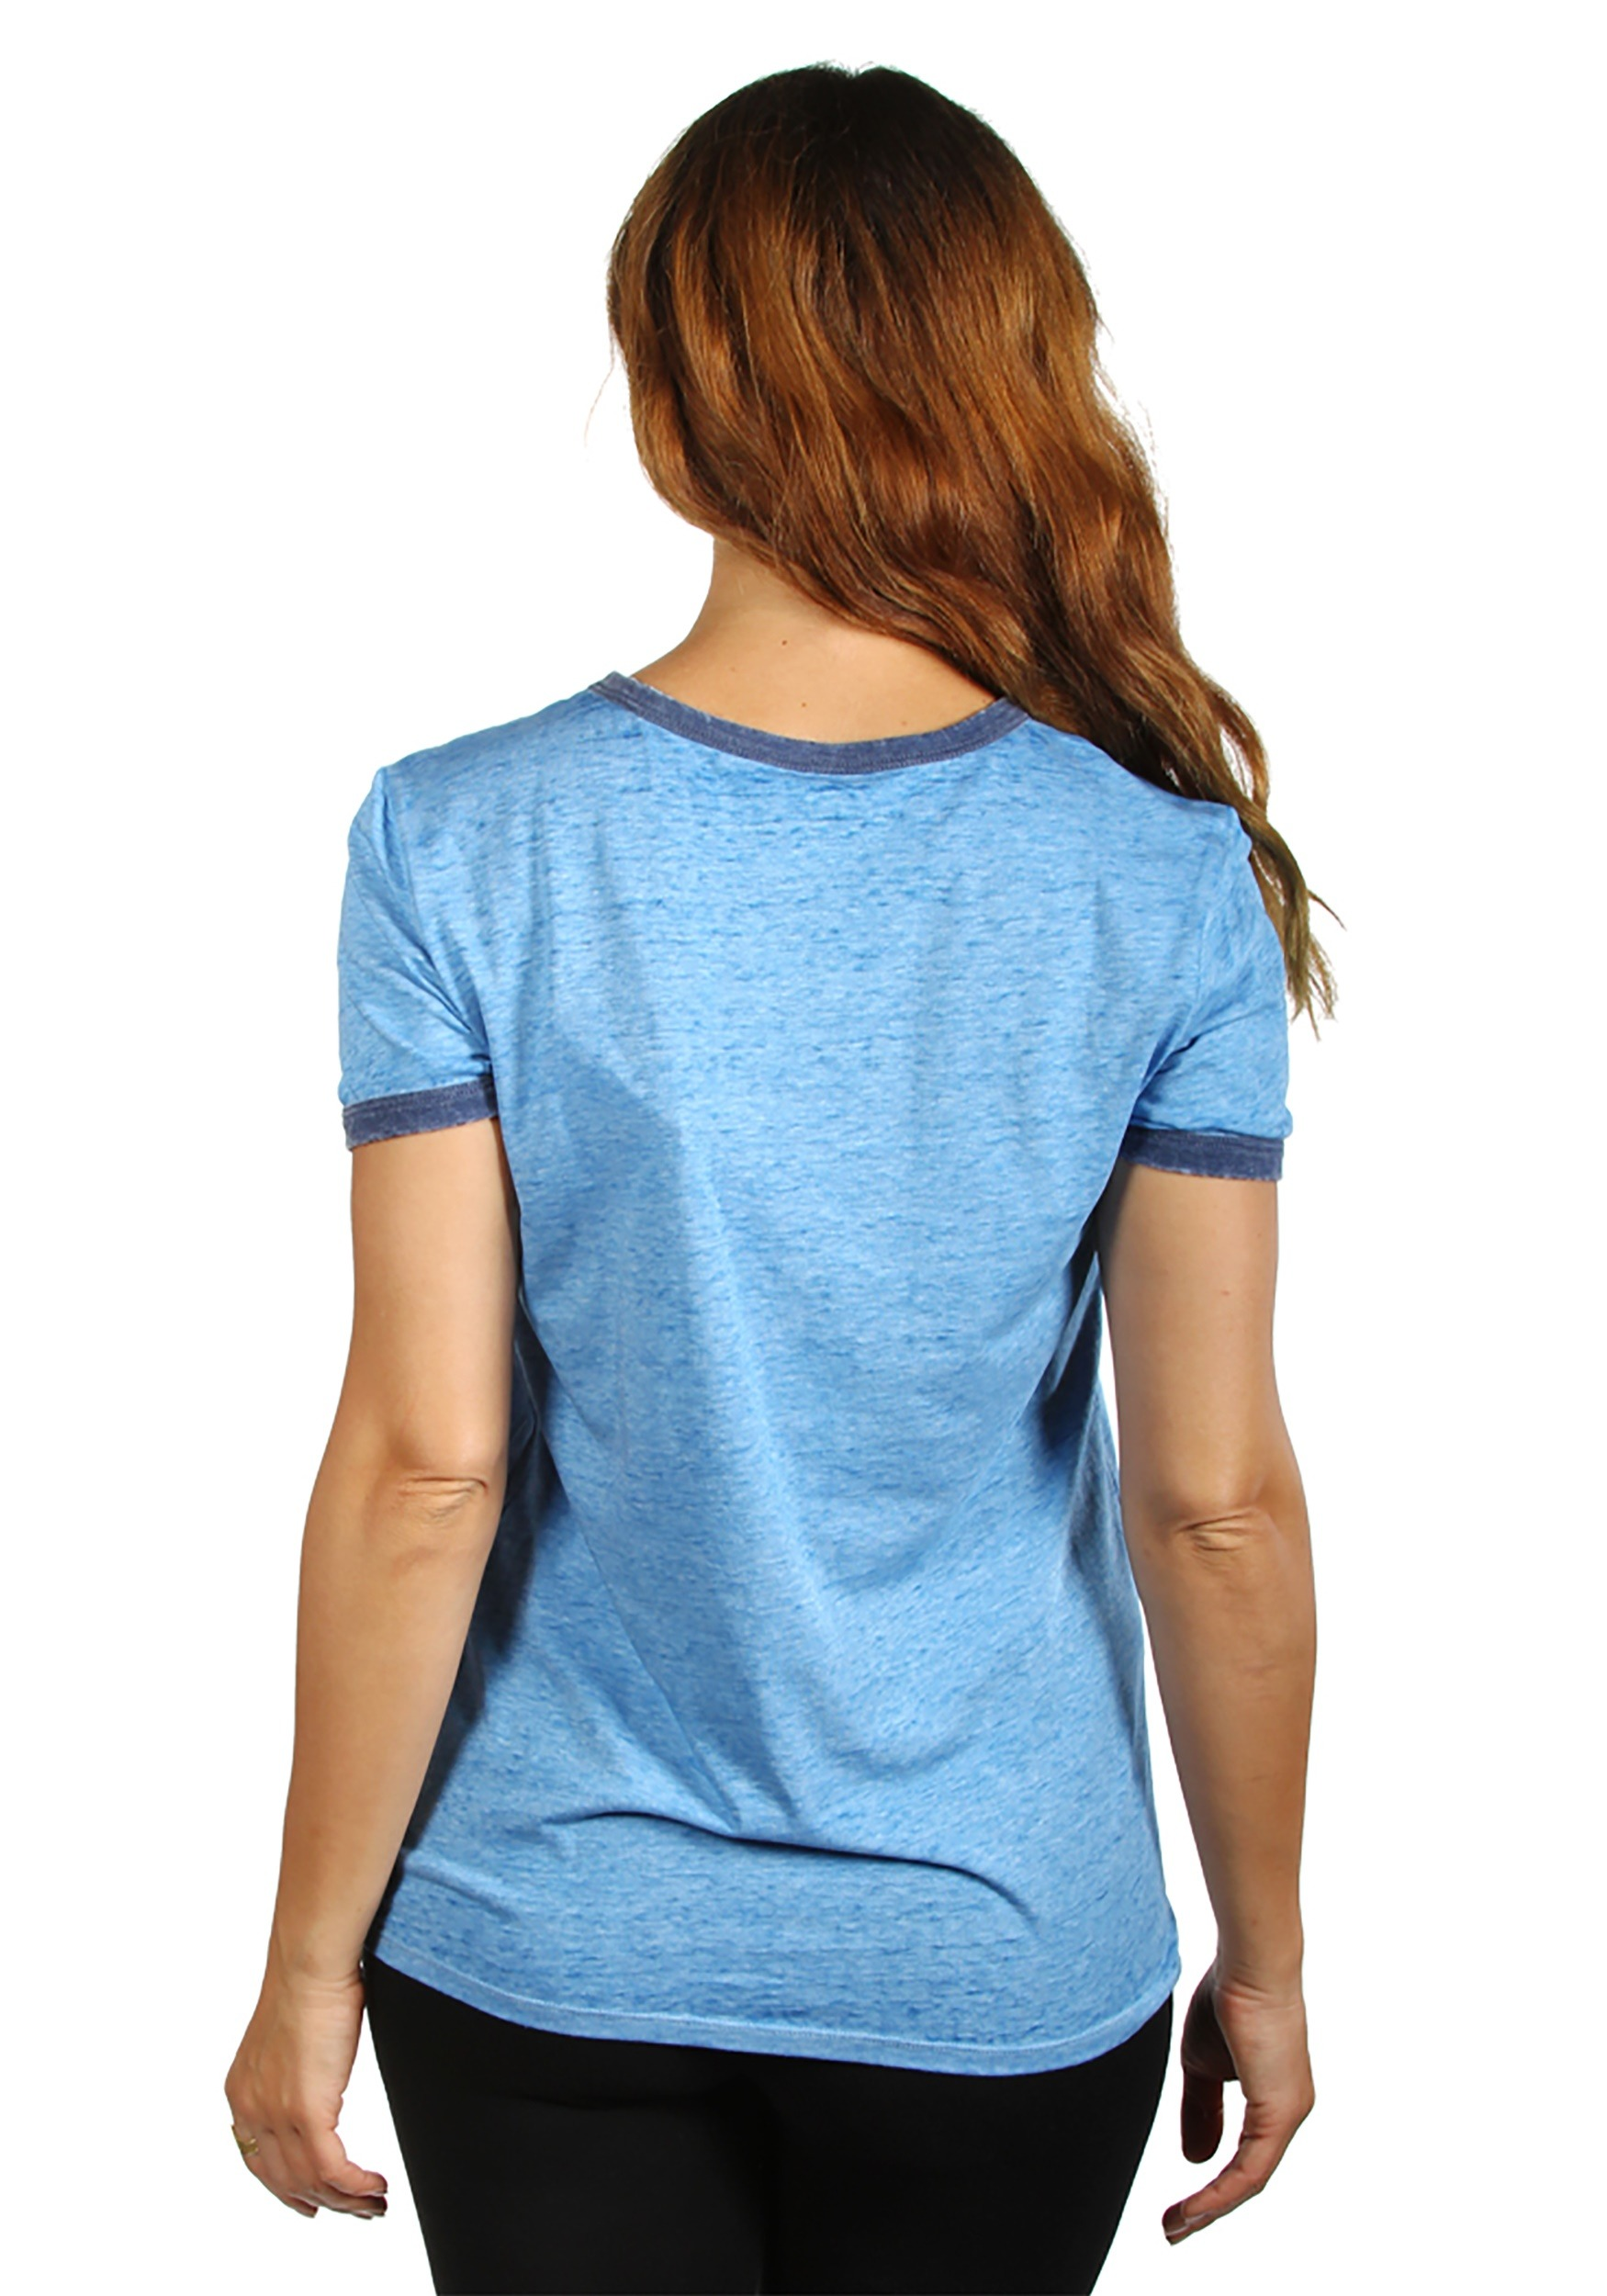 ef7a5fa044c Women s Disney Stitch Aloha Blue Ringer T-Shirt Back